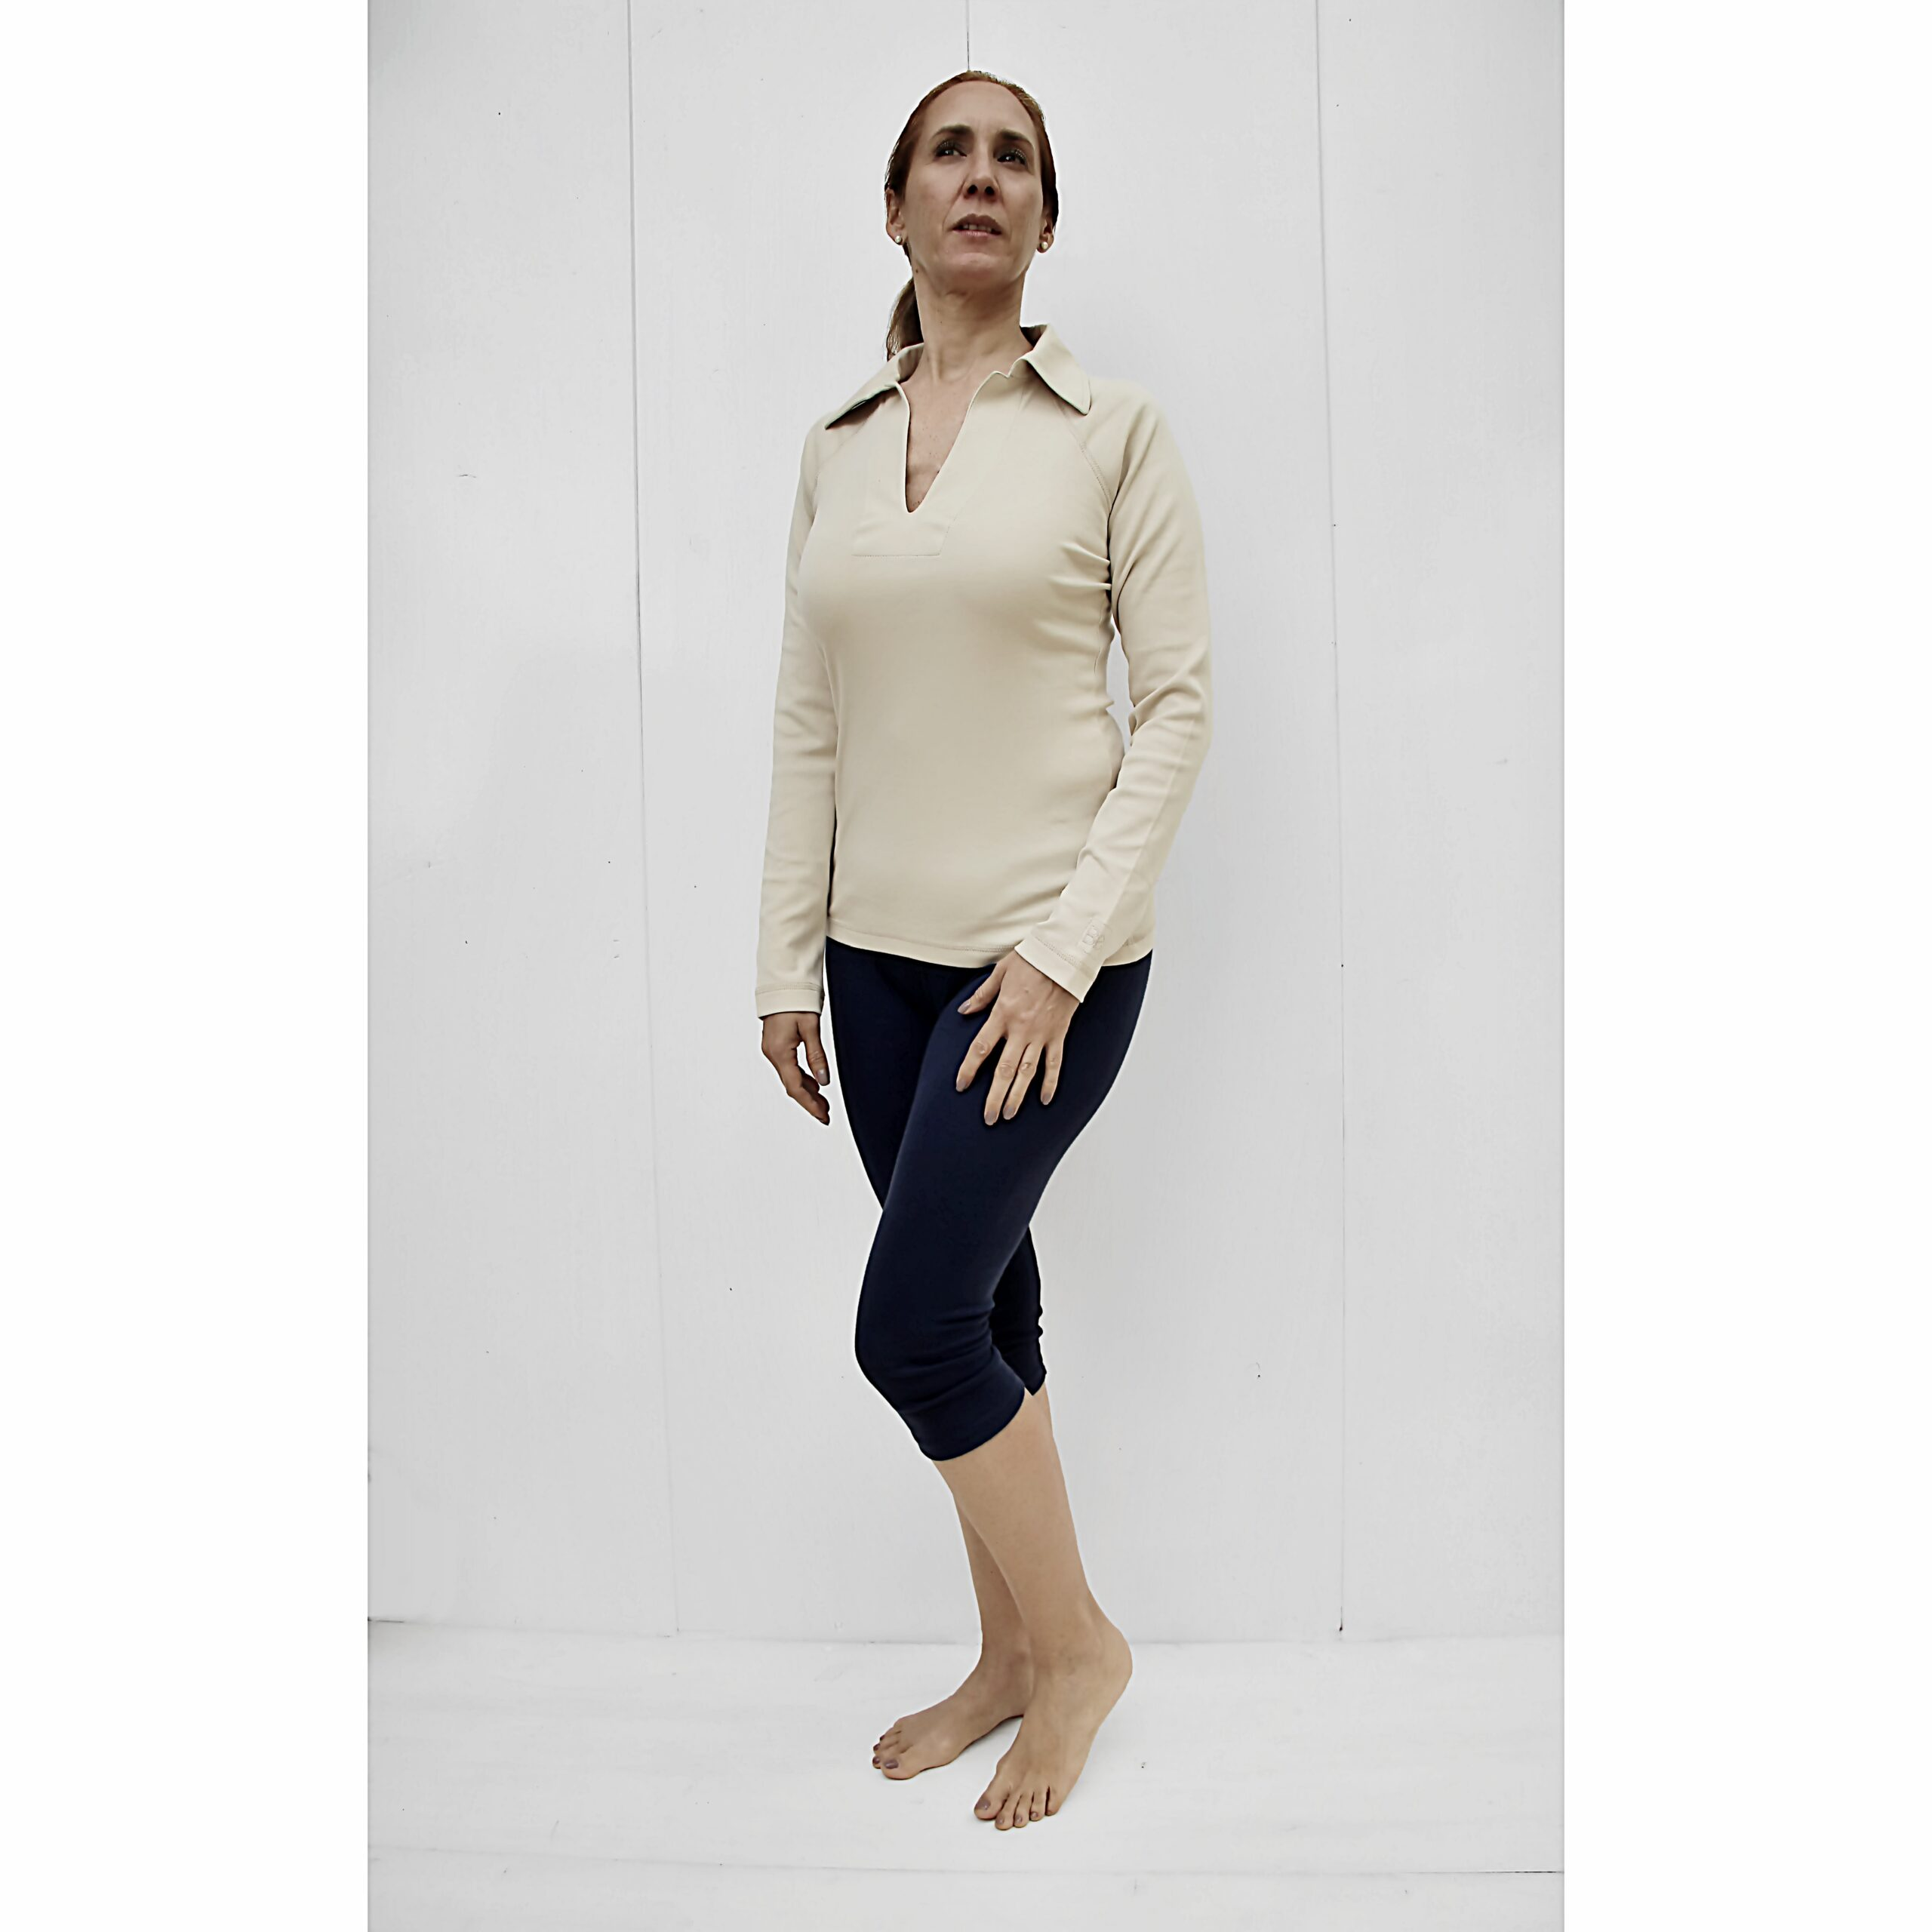 long-sleeve-polo-t-shirt organic pima cotton raglant sleeve slowfashion fairfashion